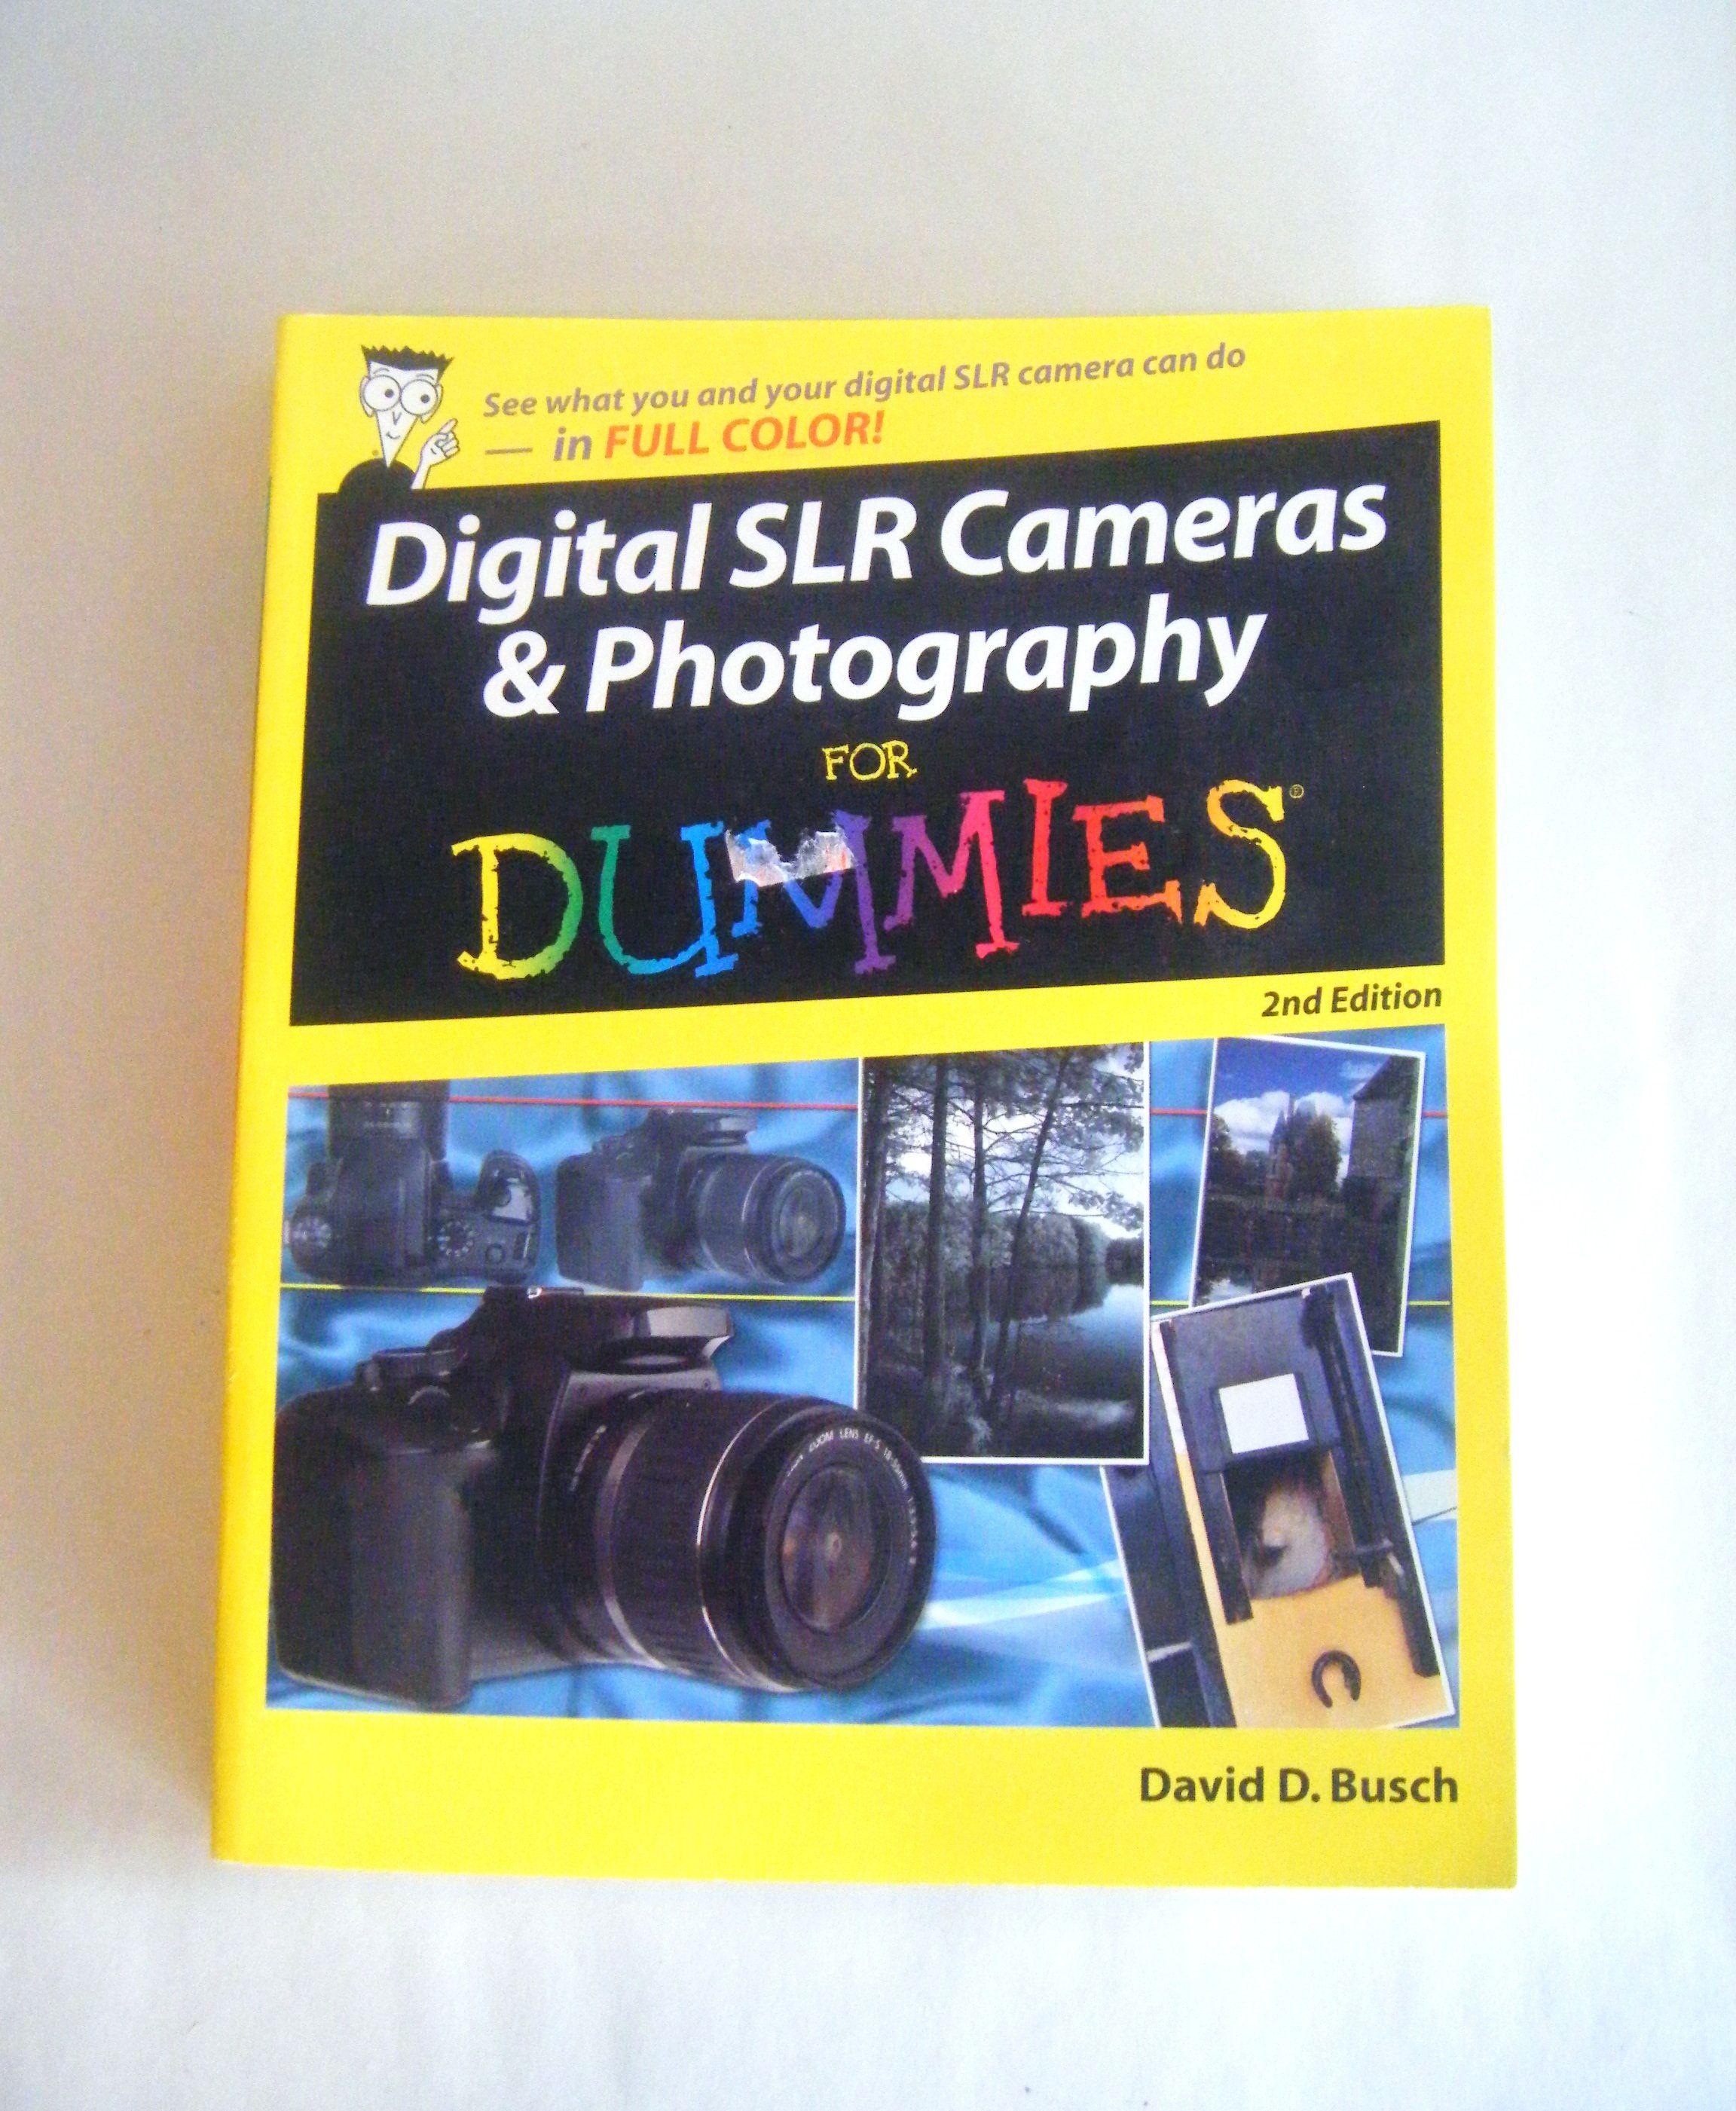 Digital SLR Cameras & Photography for Dummies Paperback ...